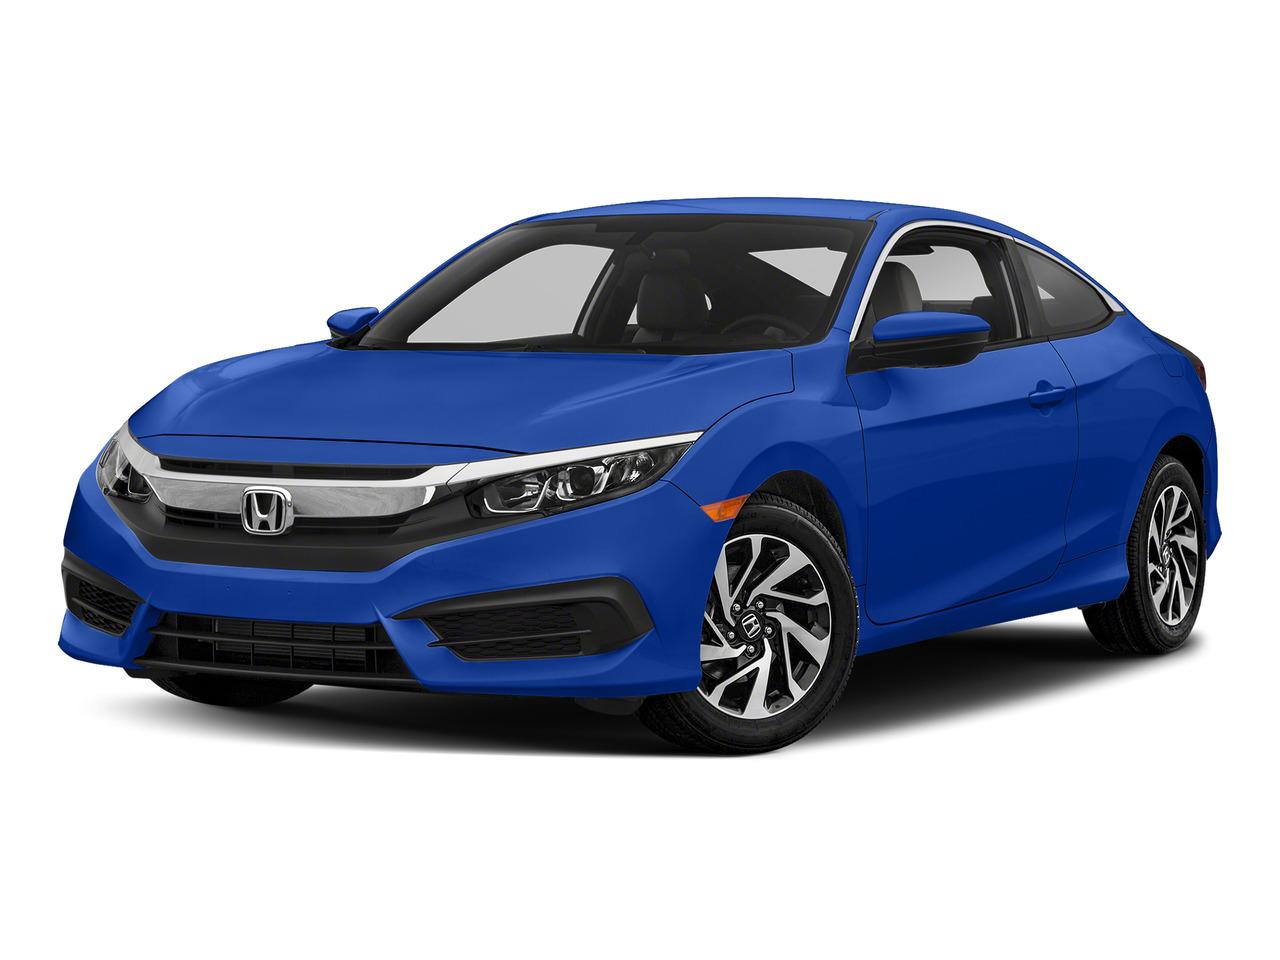 2018 Honda Civic LX MANUAL